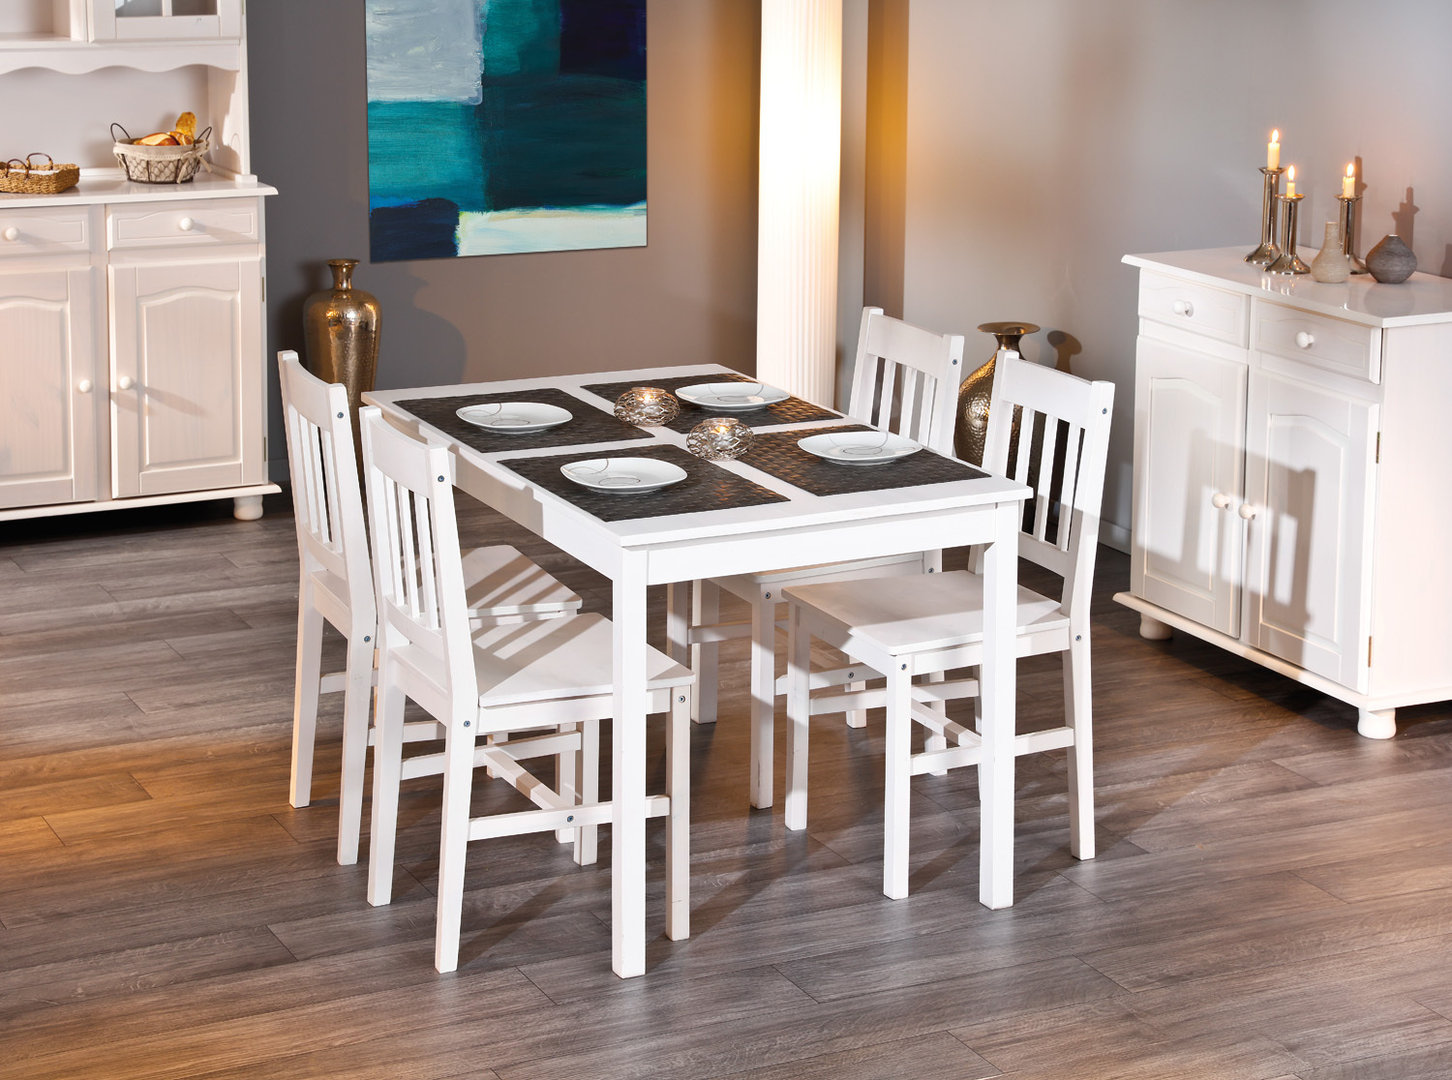 due sedie diva 67 sedia bianca moderna in legno mobile ForSedia Bianca Moderna